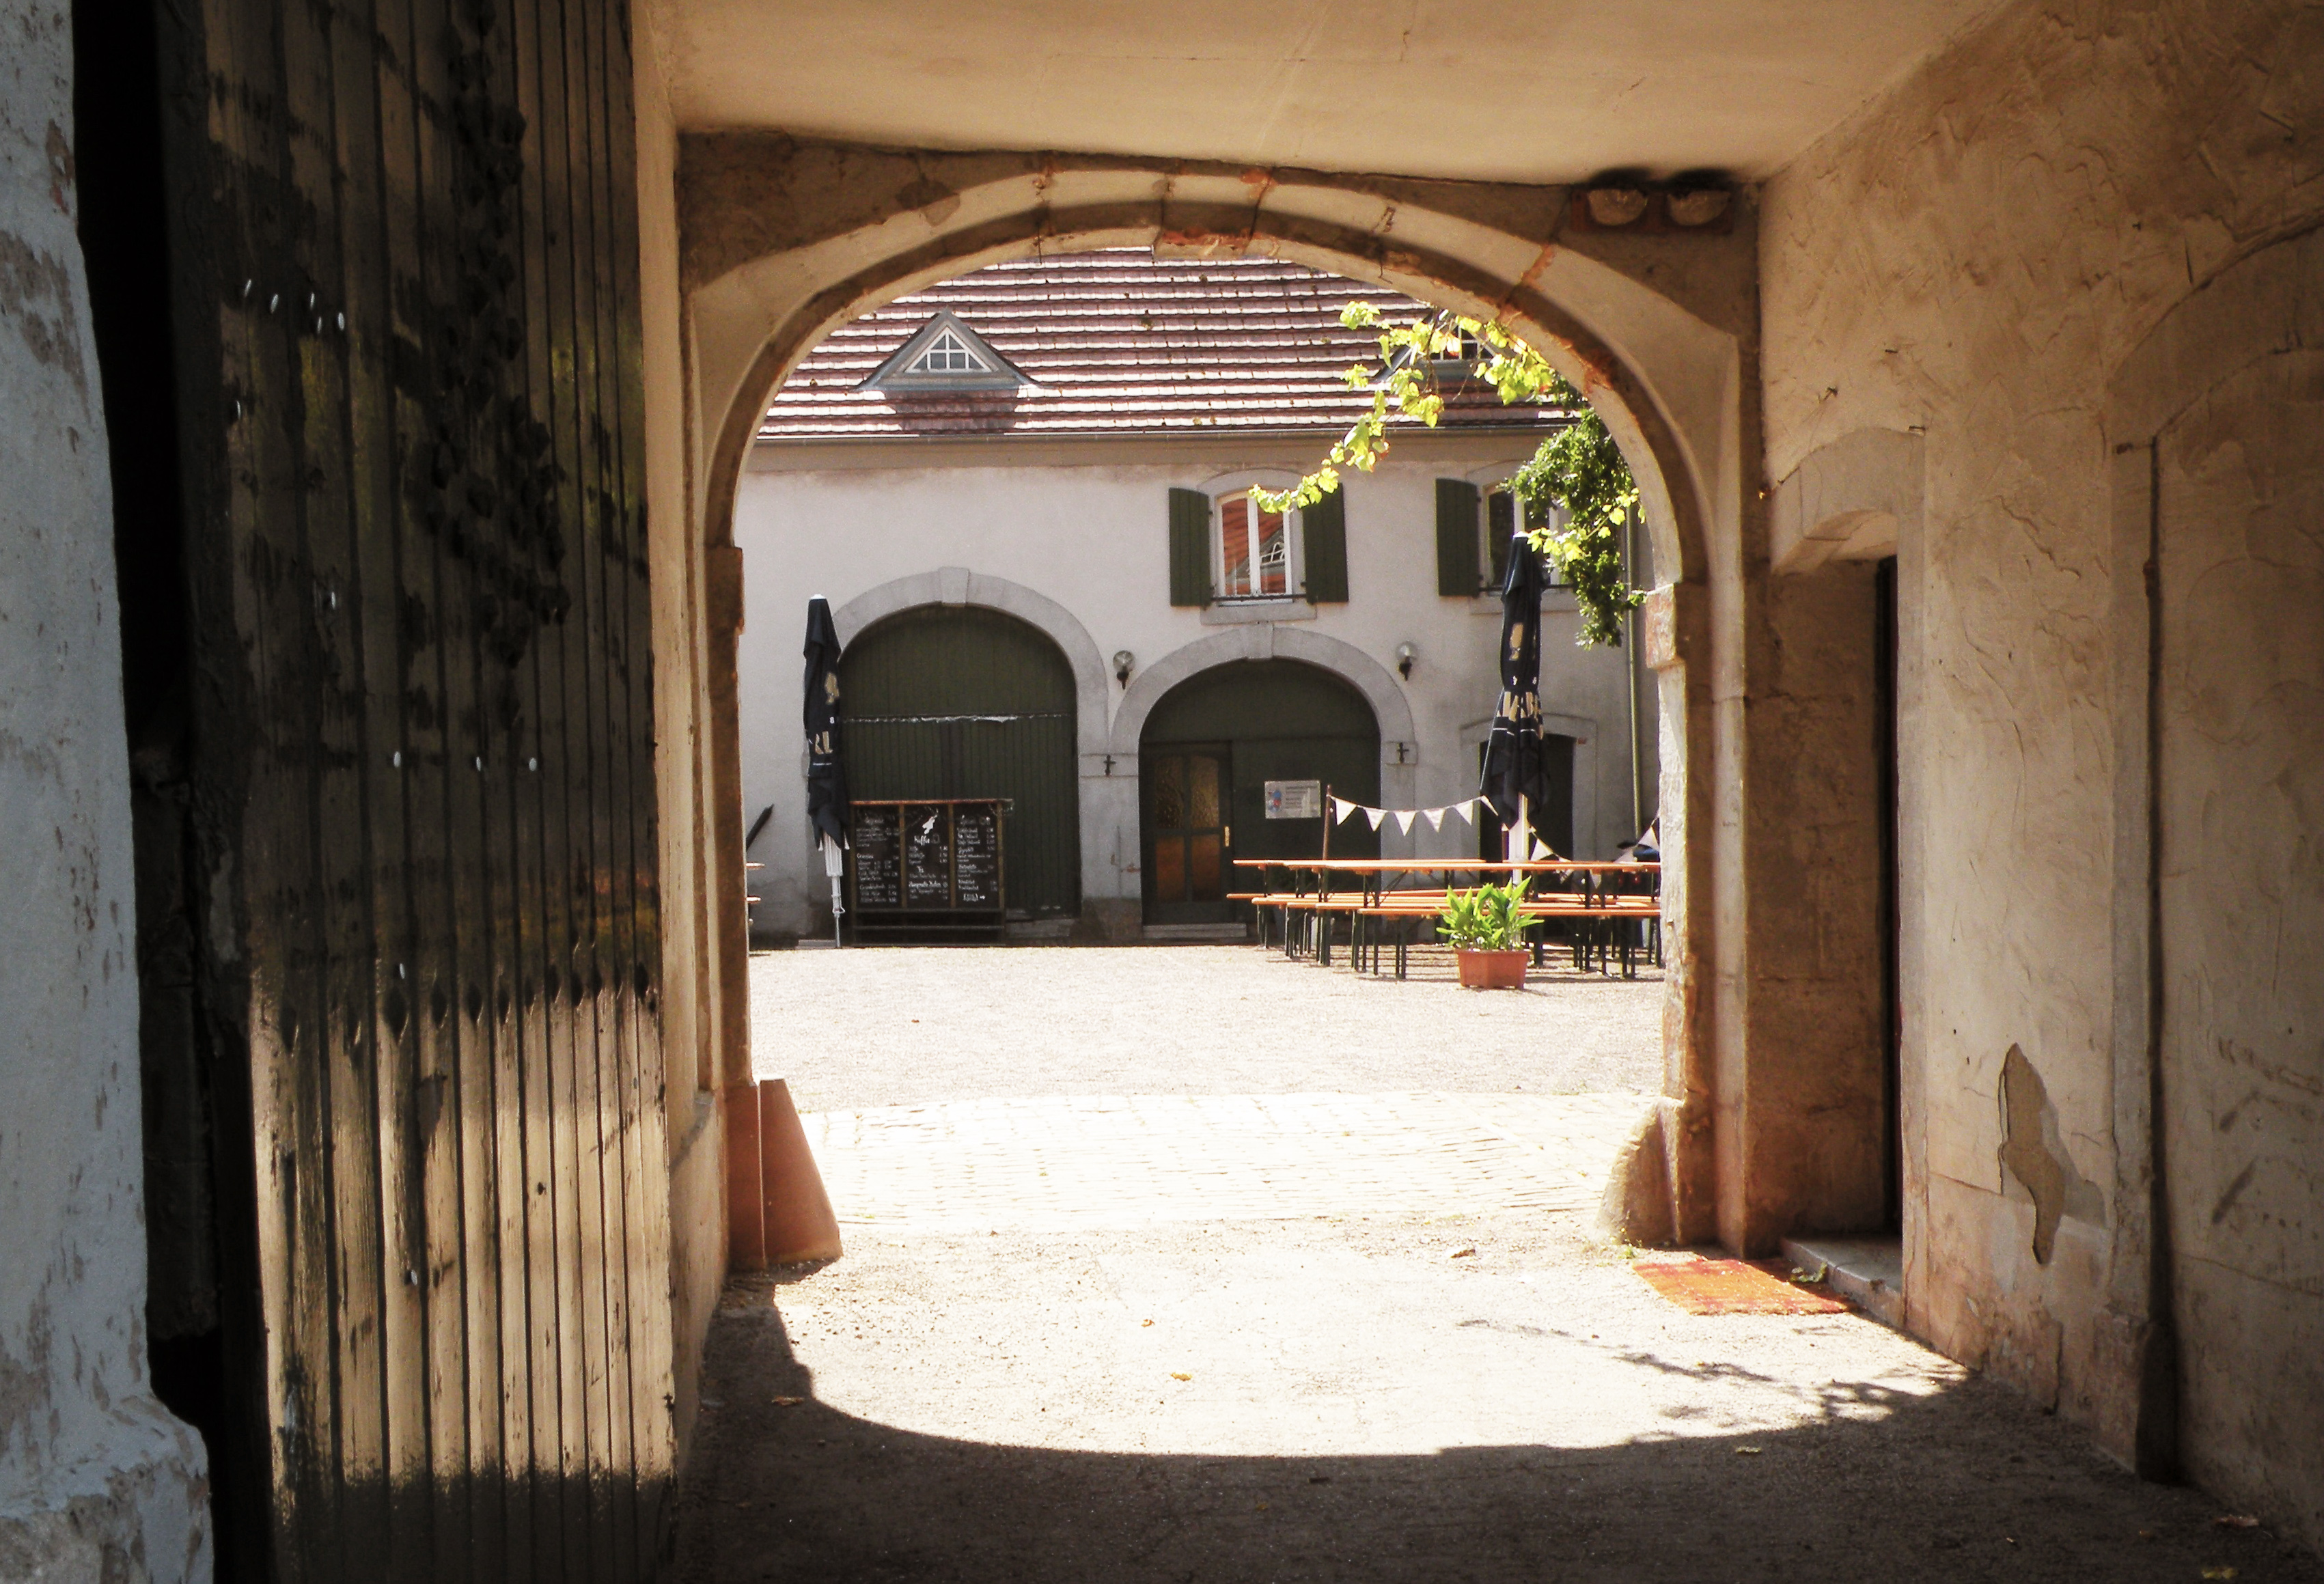 Toreinfahrt Jagdschloss Karlsbrunn